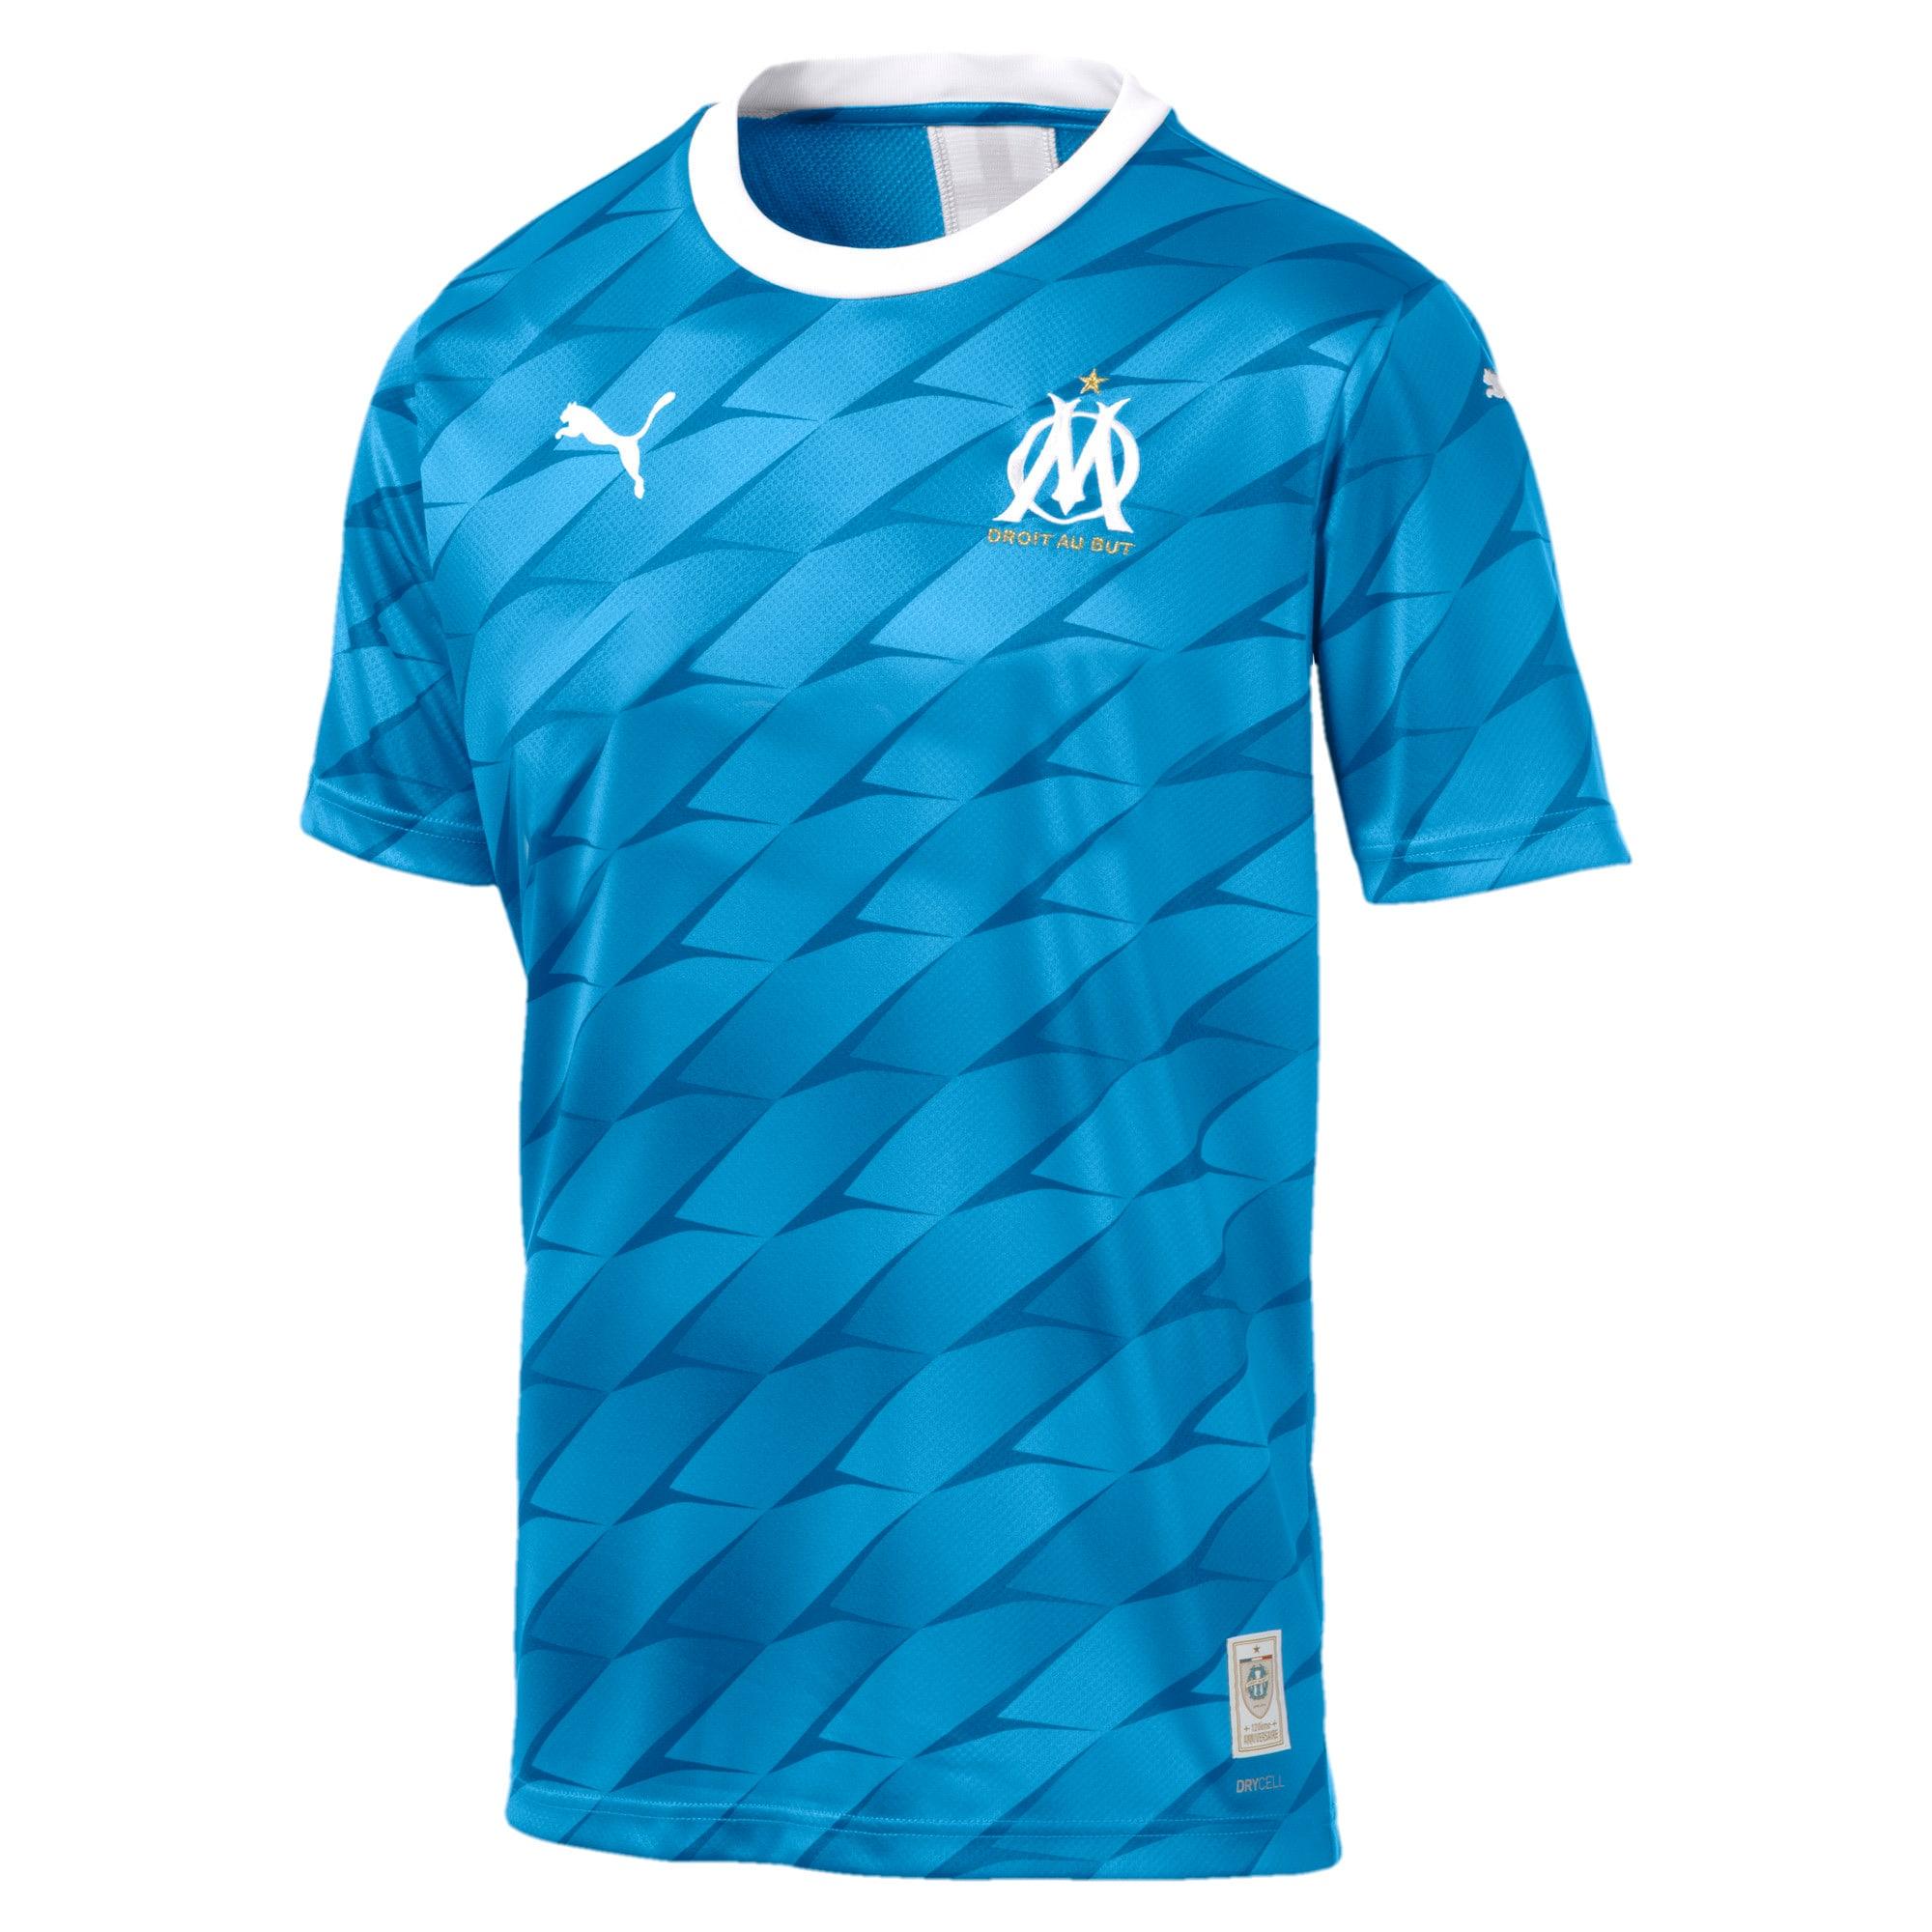 Thumbnail 1 of Olympique de Marseille Men's Away Replica Jersey, Bleu Azur-Puma White, medium